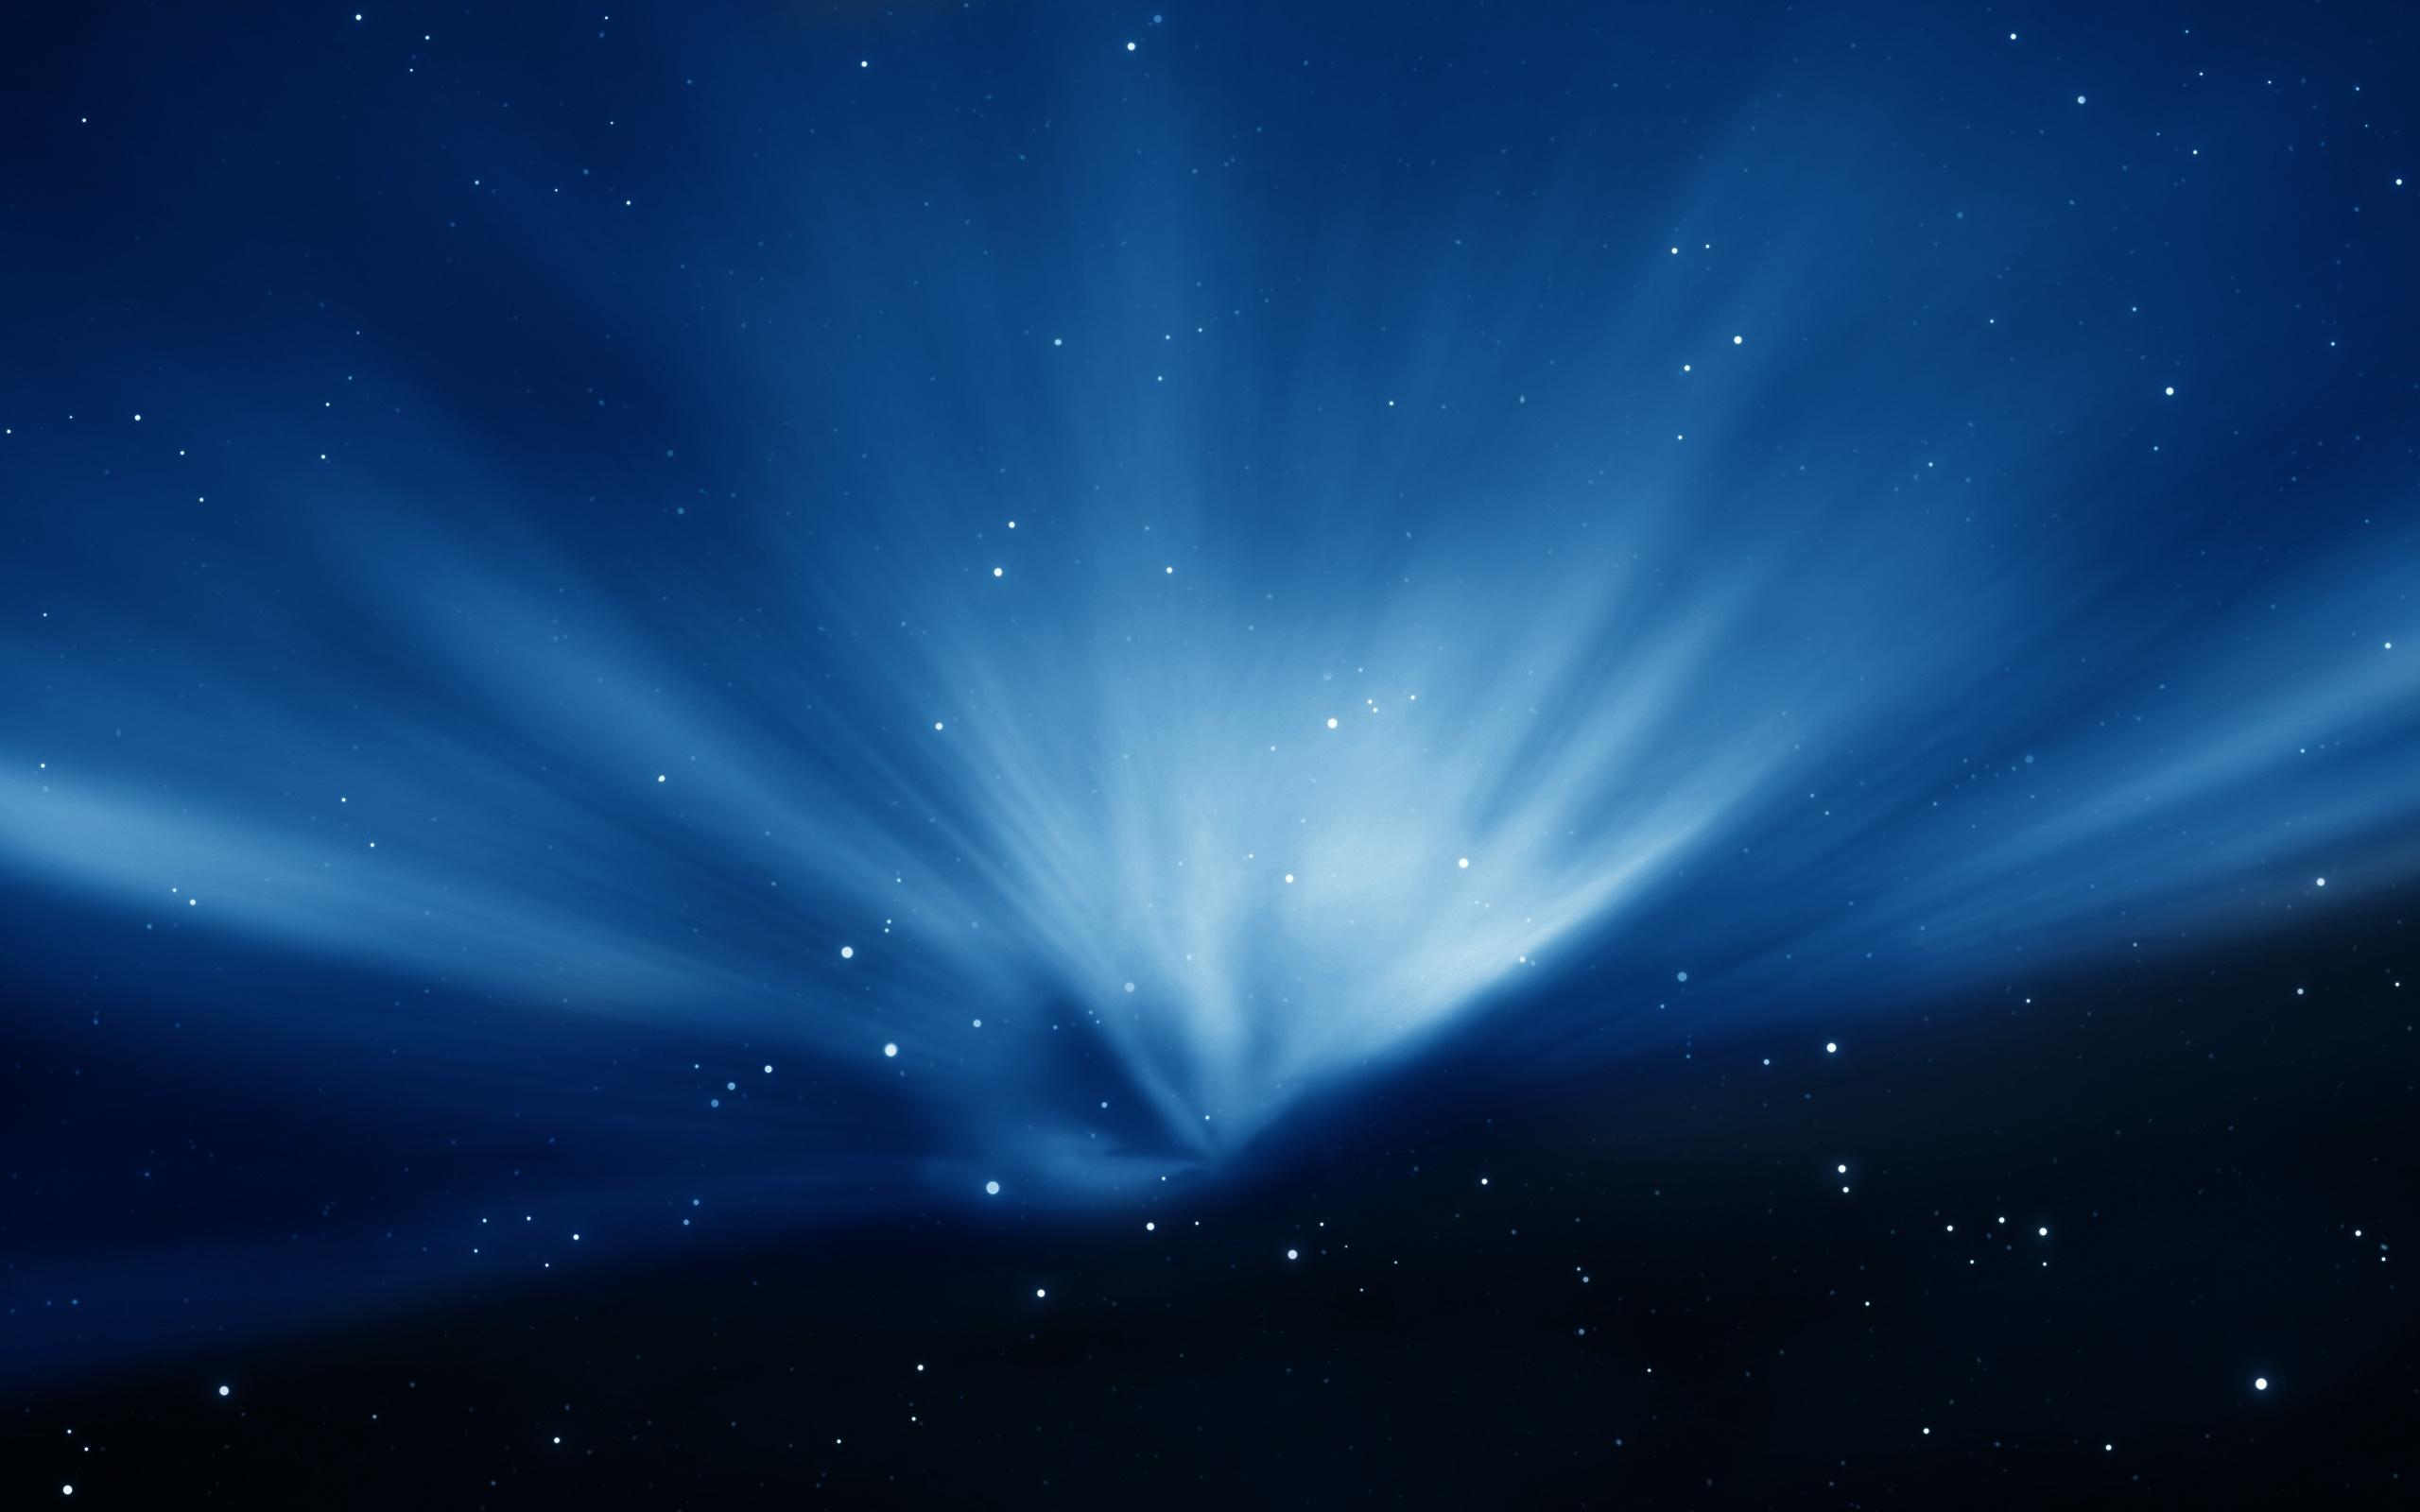 Sky Blue Aurora Mac Wallpaper Download Mac Wallpapers Download 2560x1600